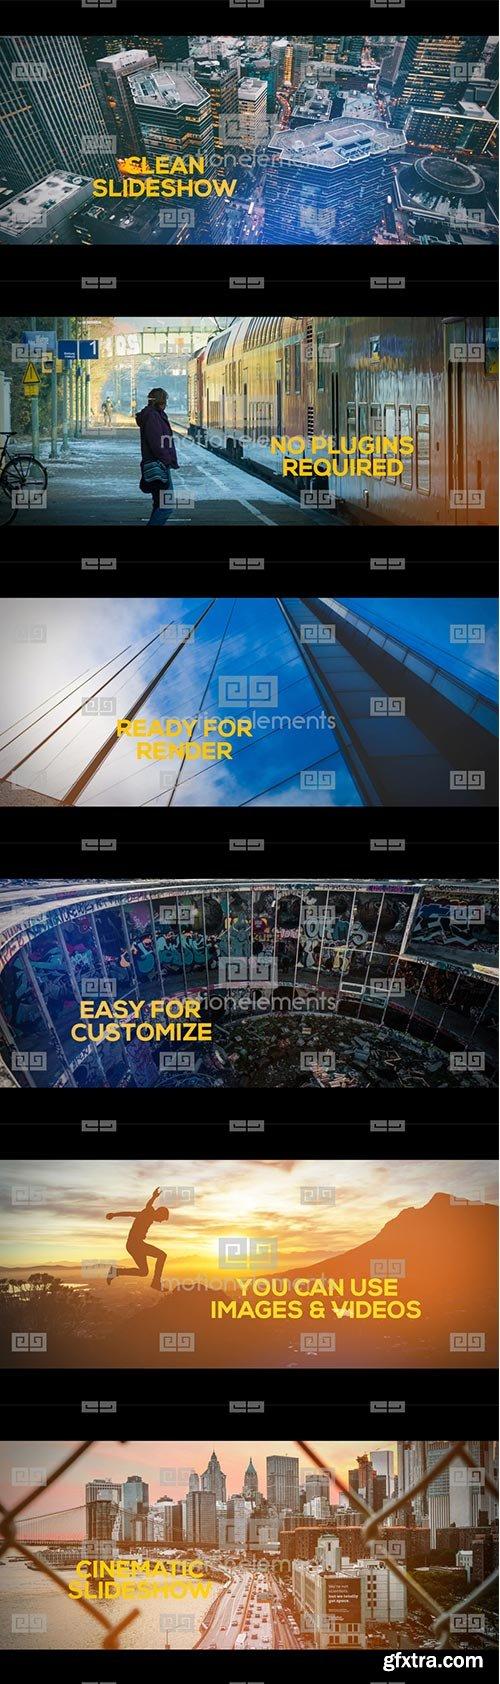 MotionElements - Clean Dynamic Slideshow - 11655991